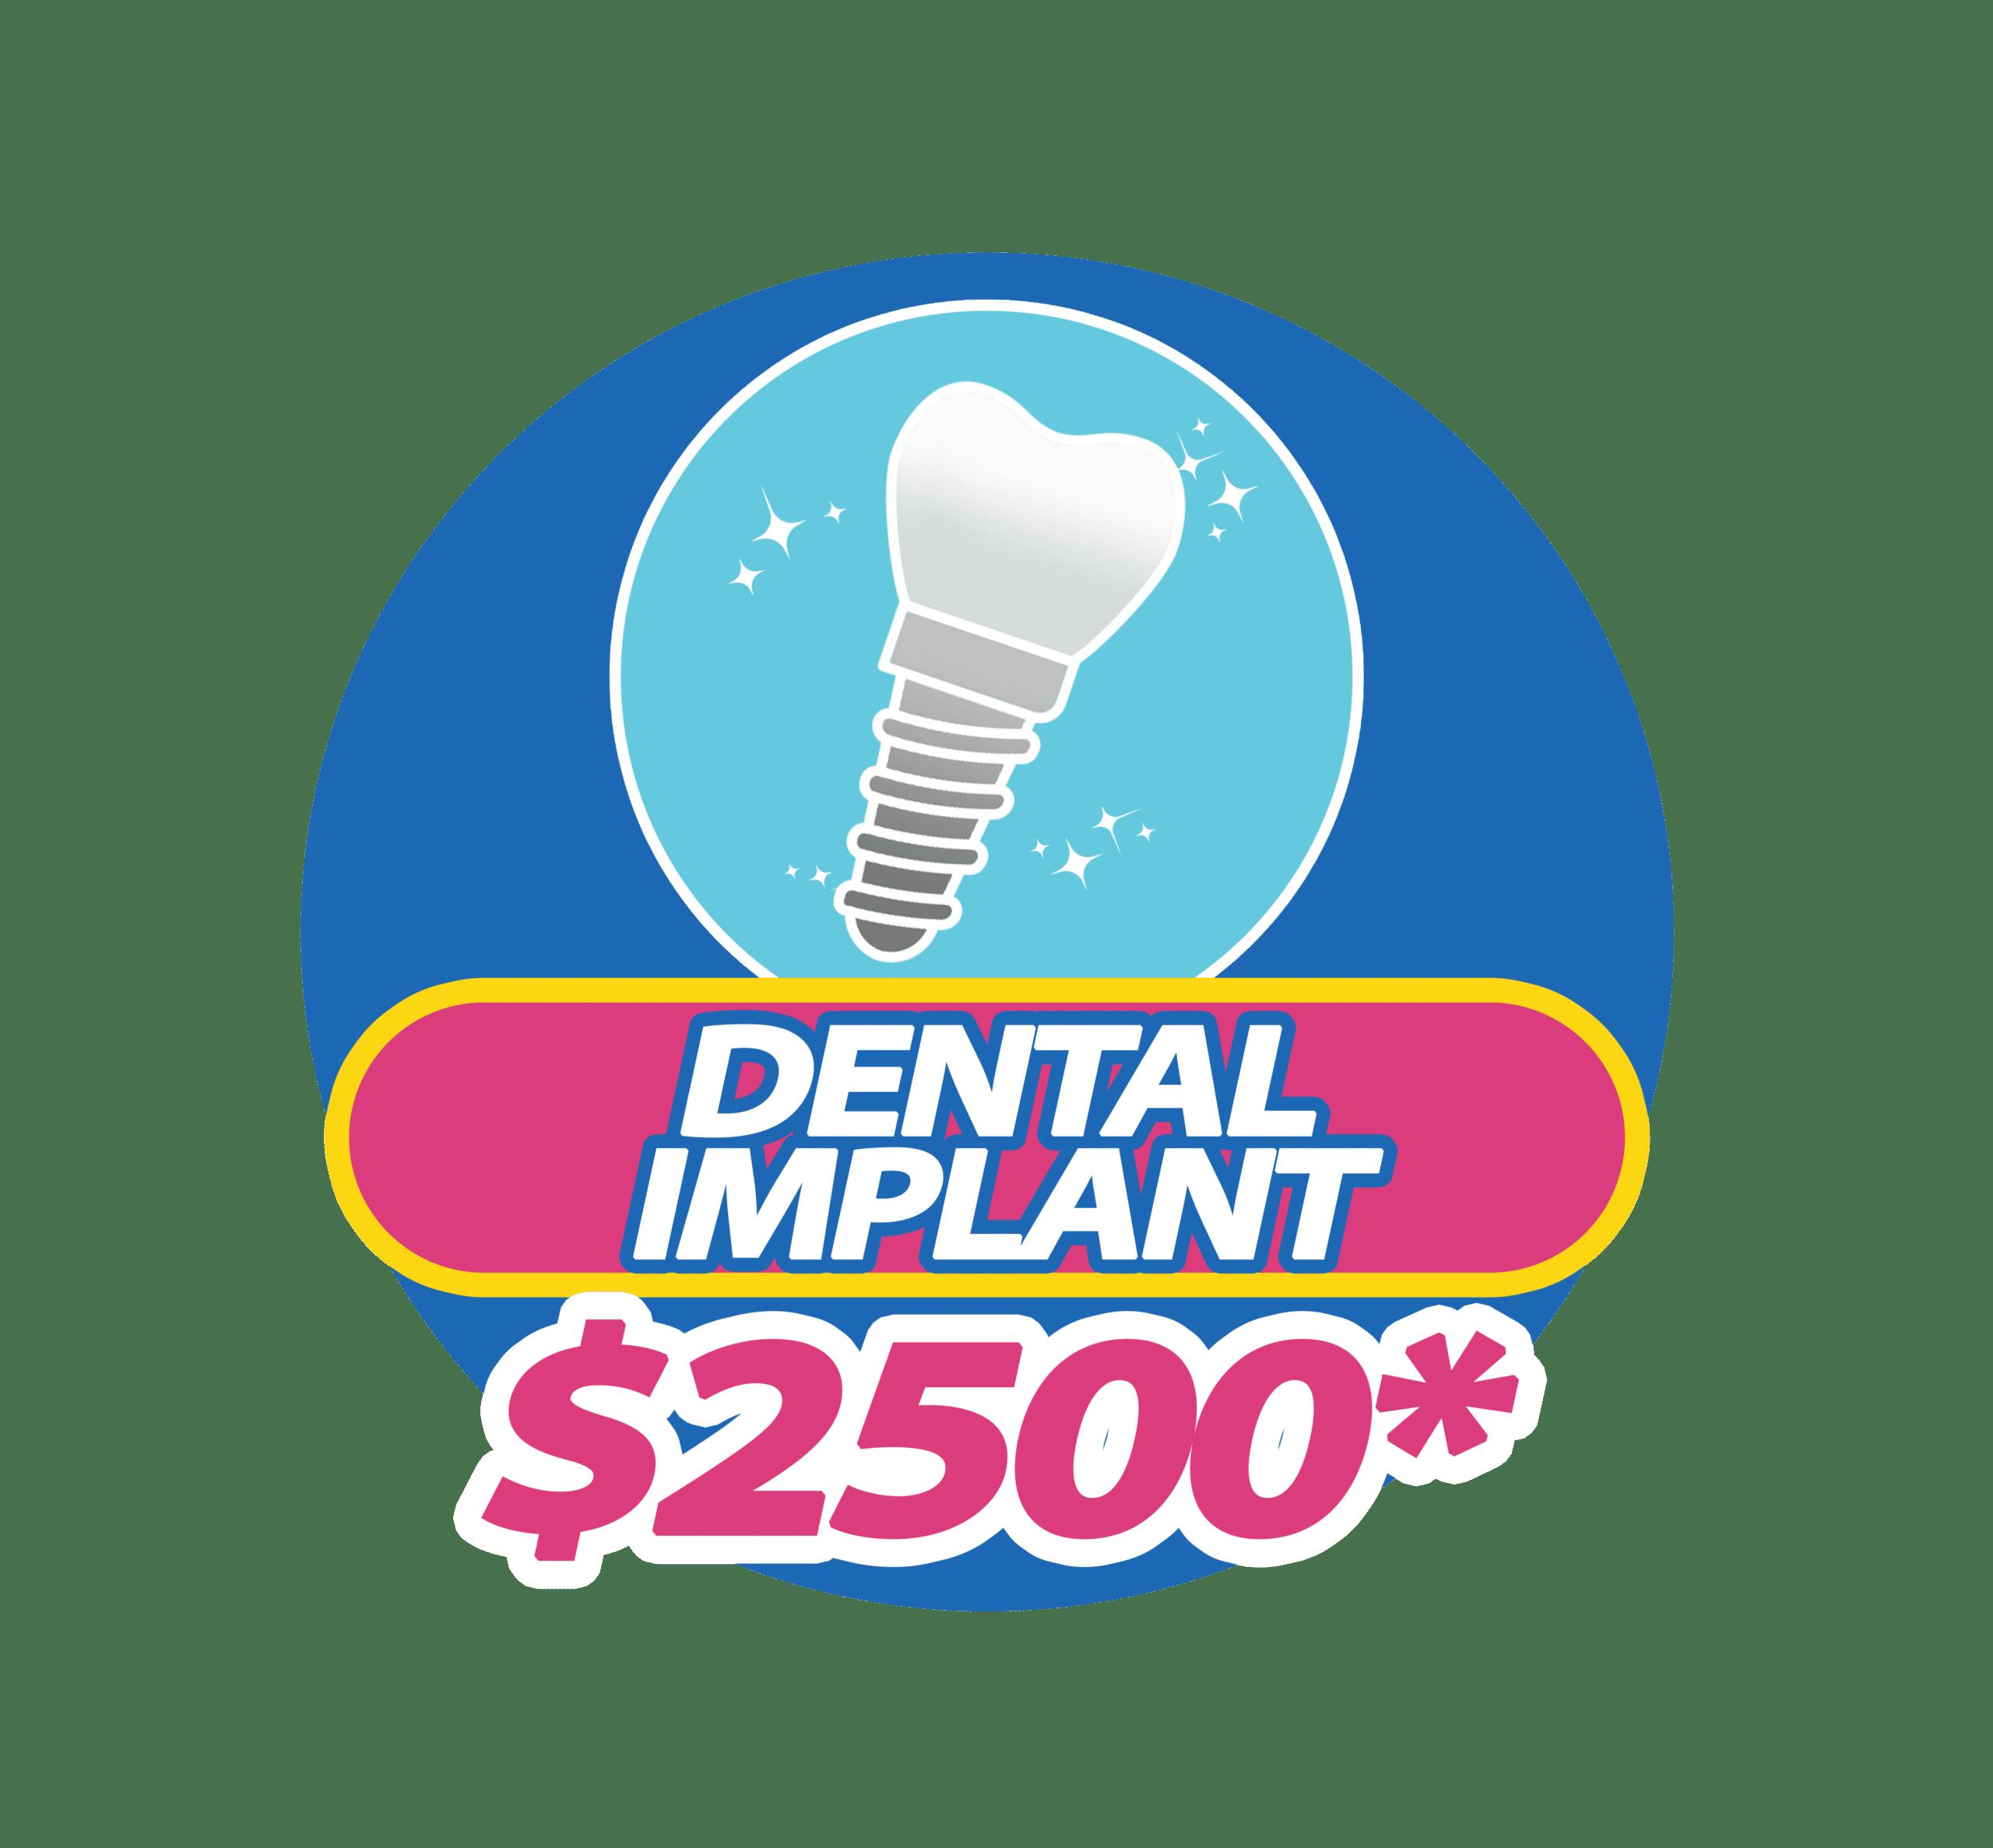 Dental Implants at Somos Dental & Orthodotics